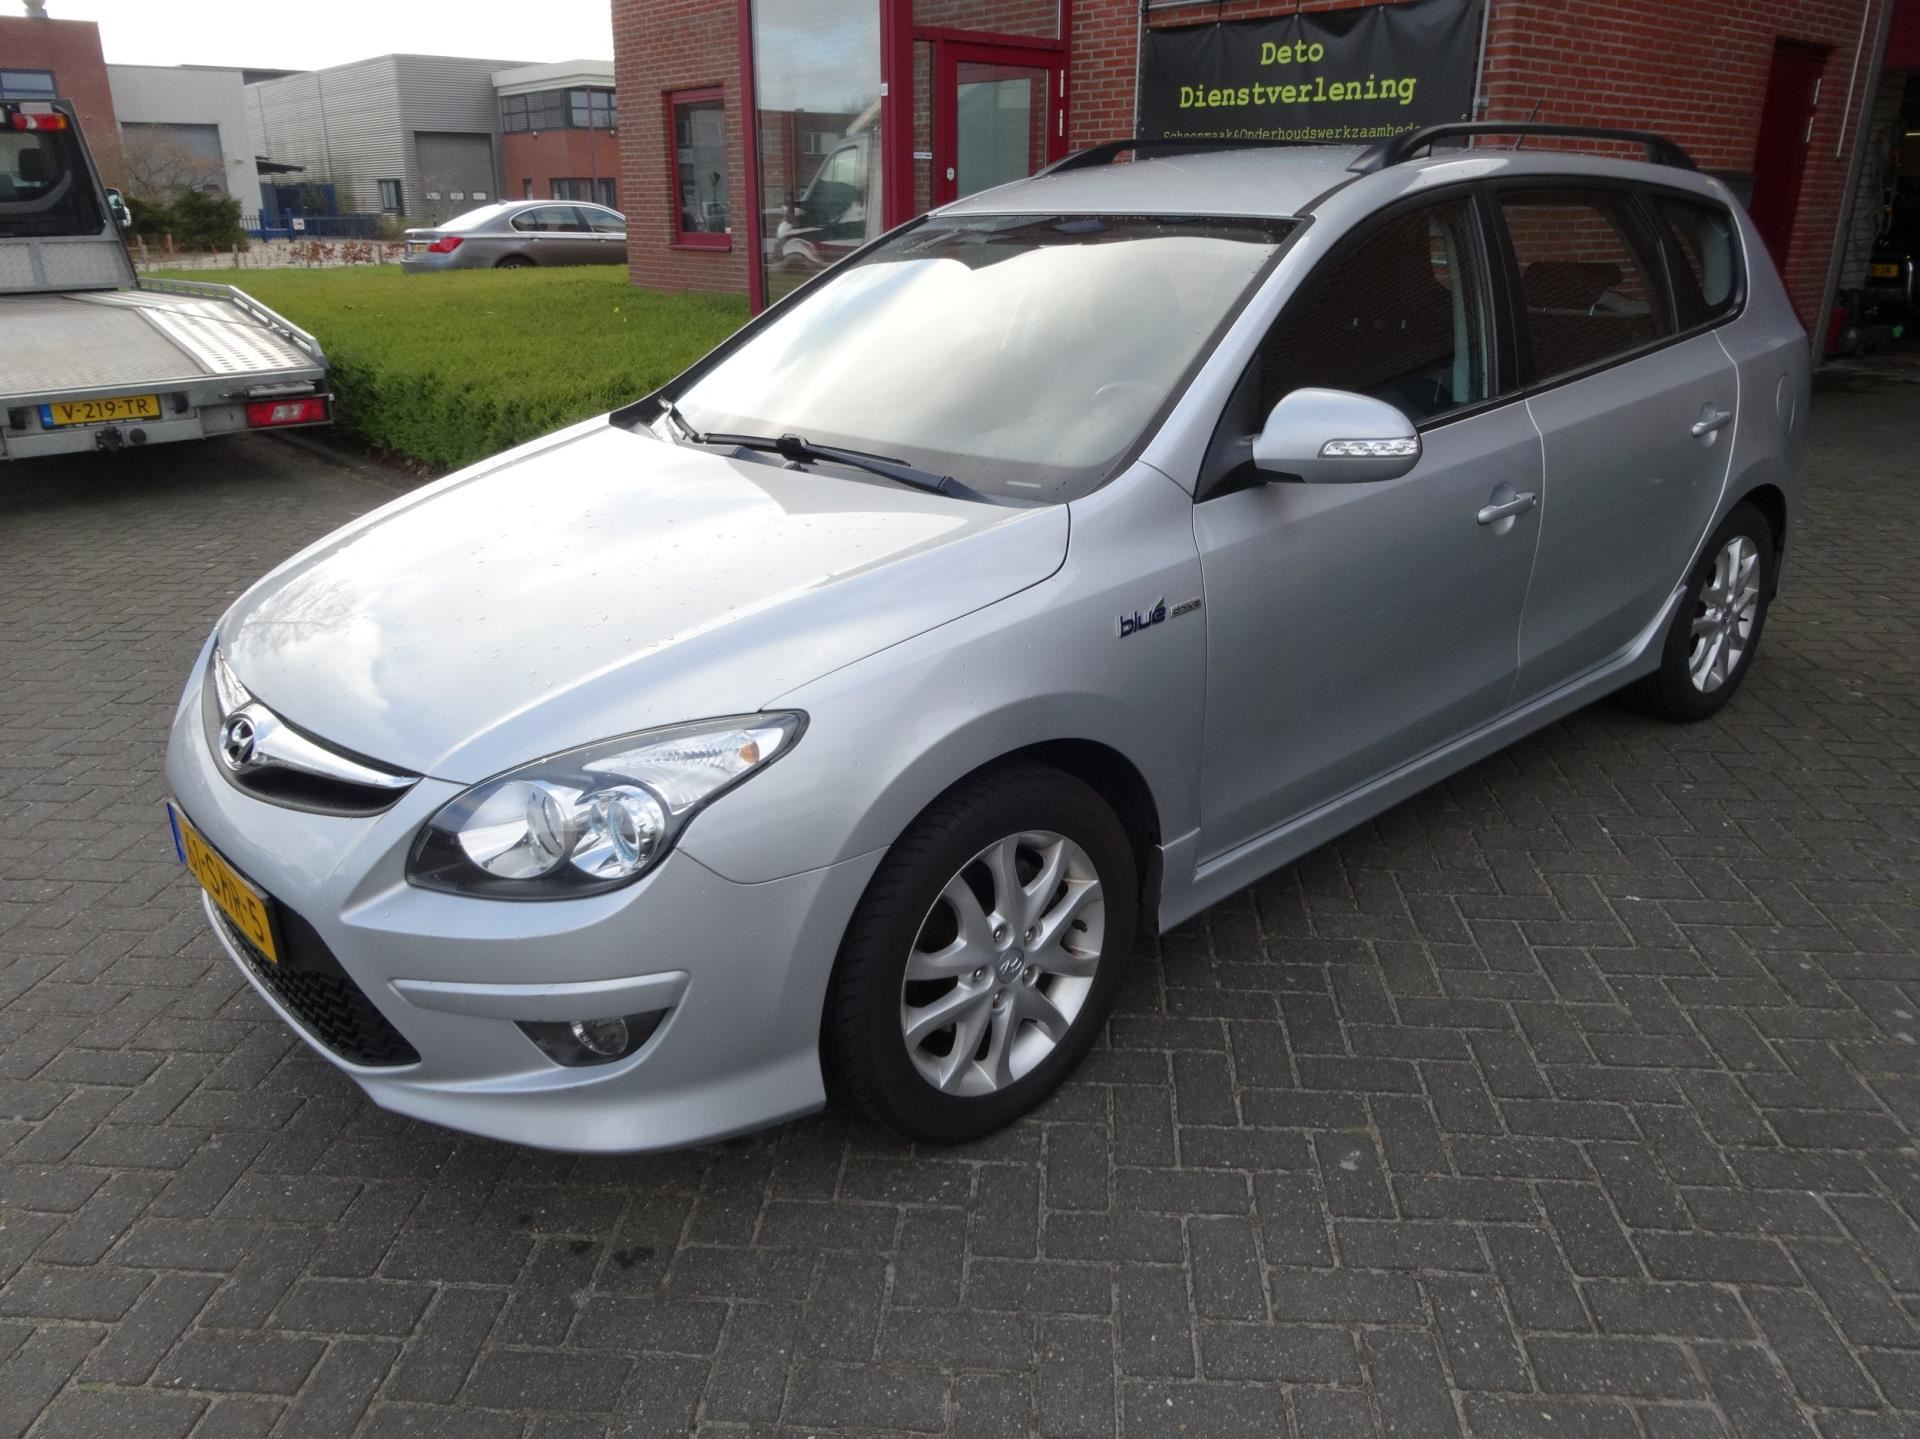 Hyundai I30 CW occasion - Handelsonderneming Deto